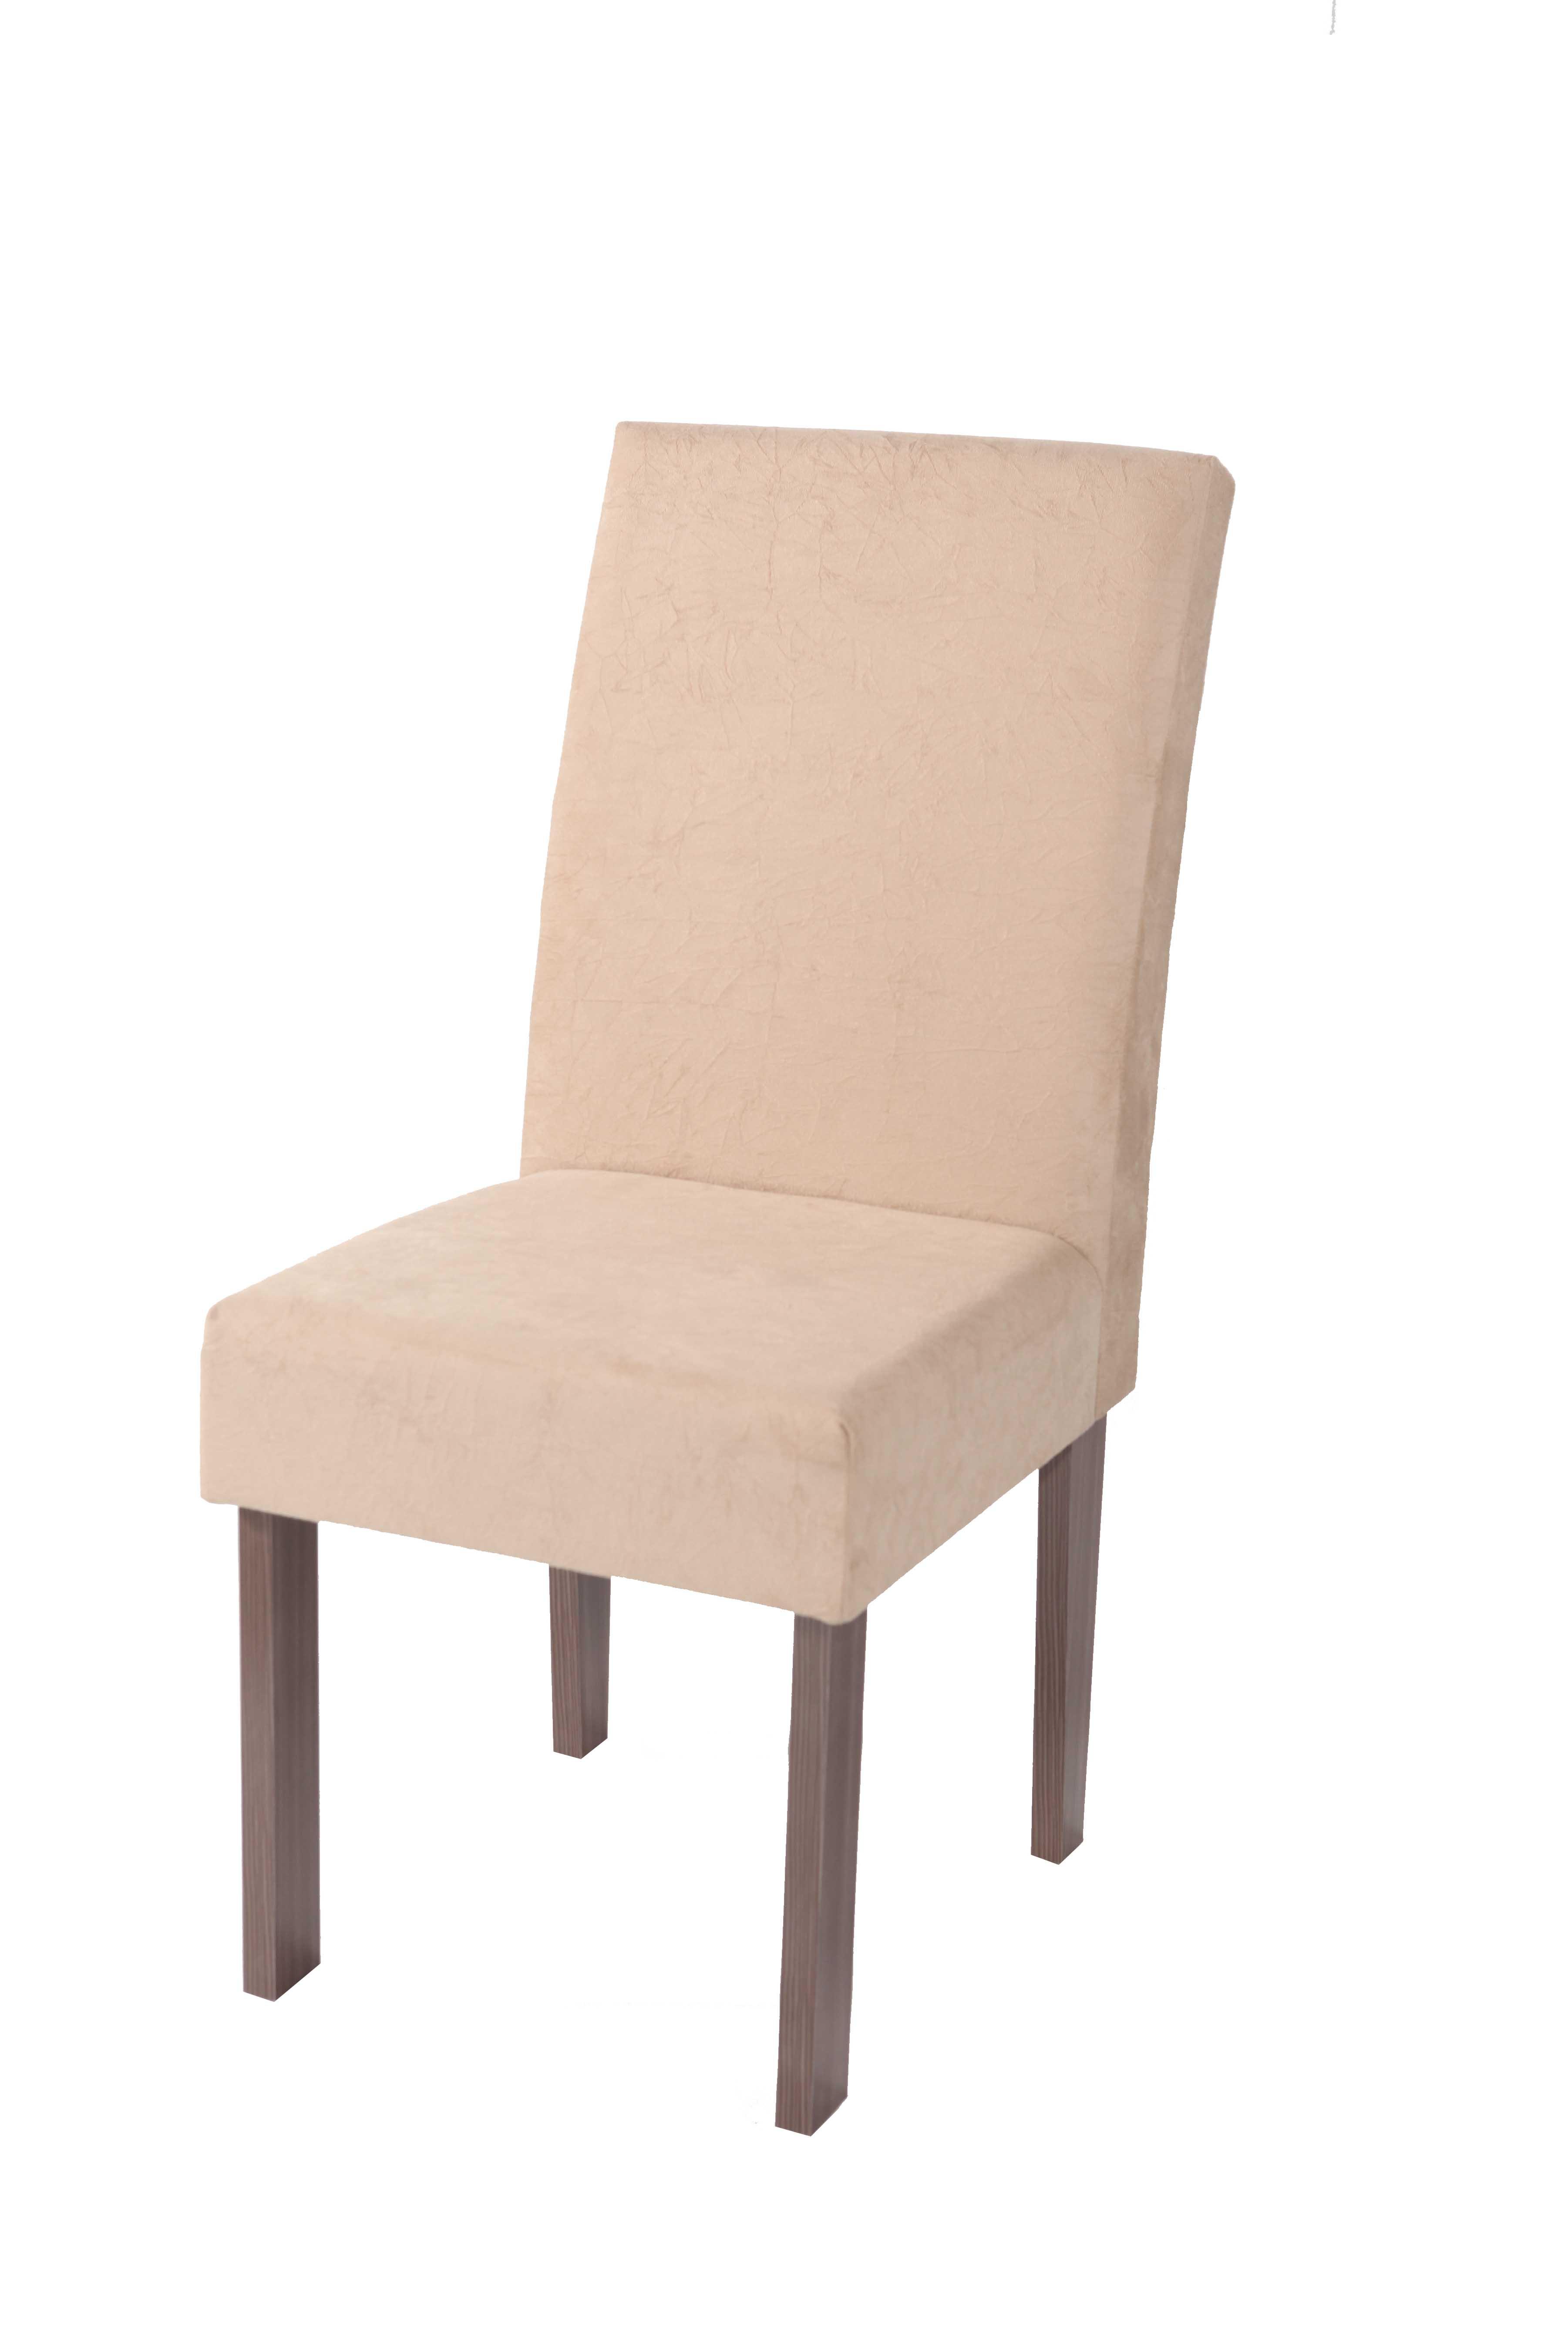 Cadeira_Cristal__Ebano_Fosco_-___Sued_Bege